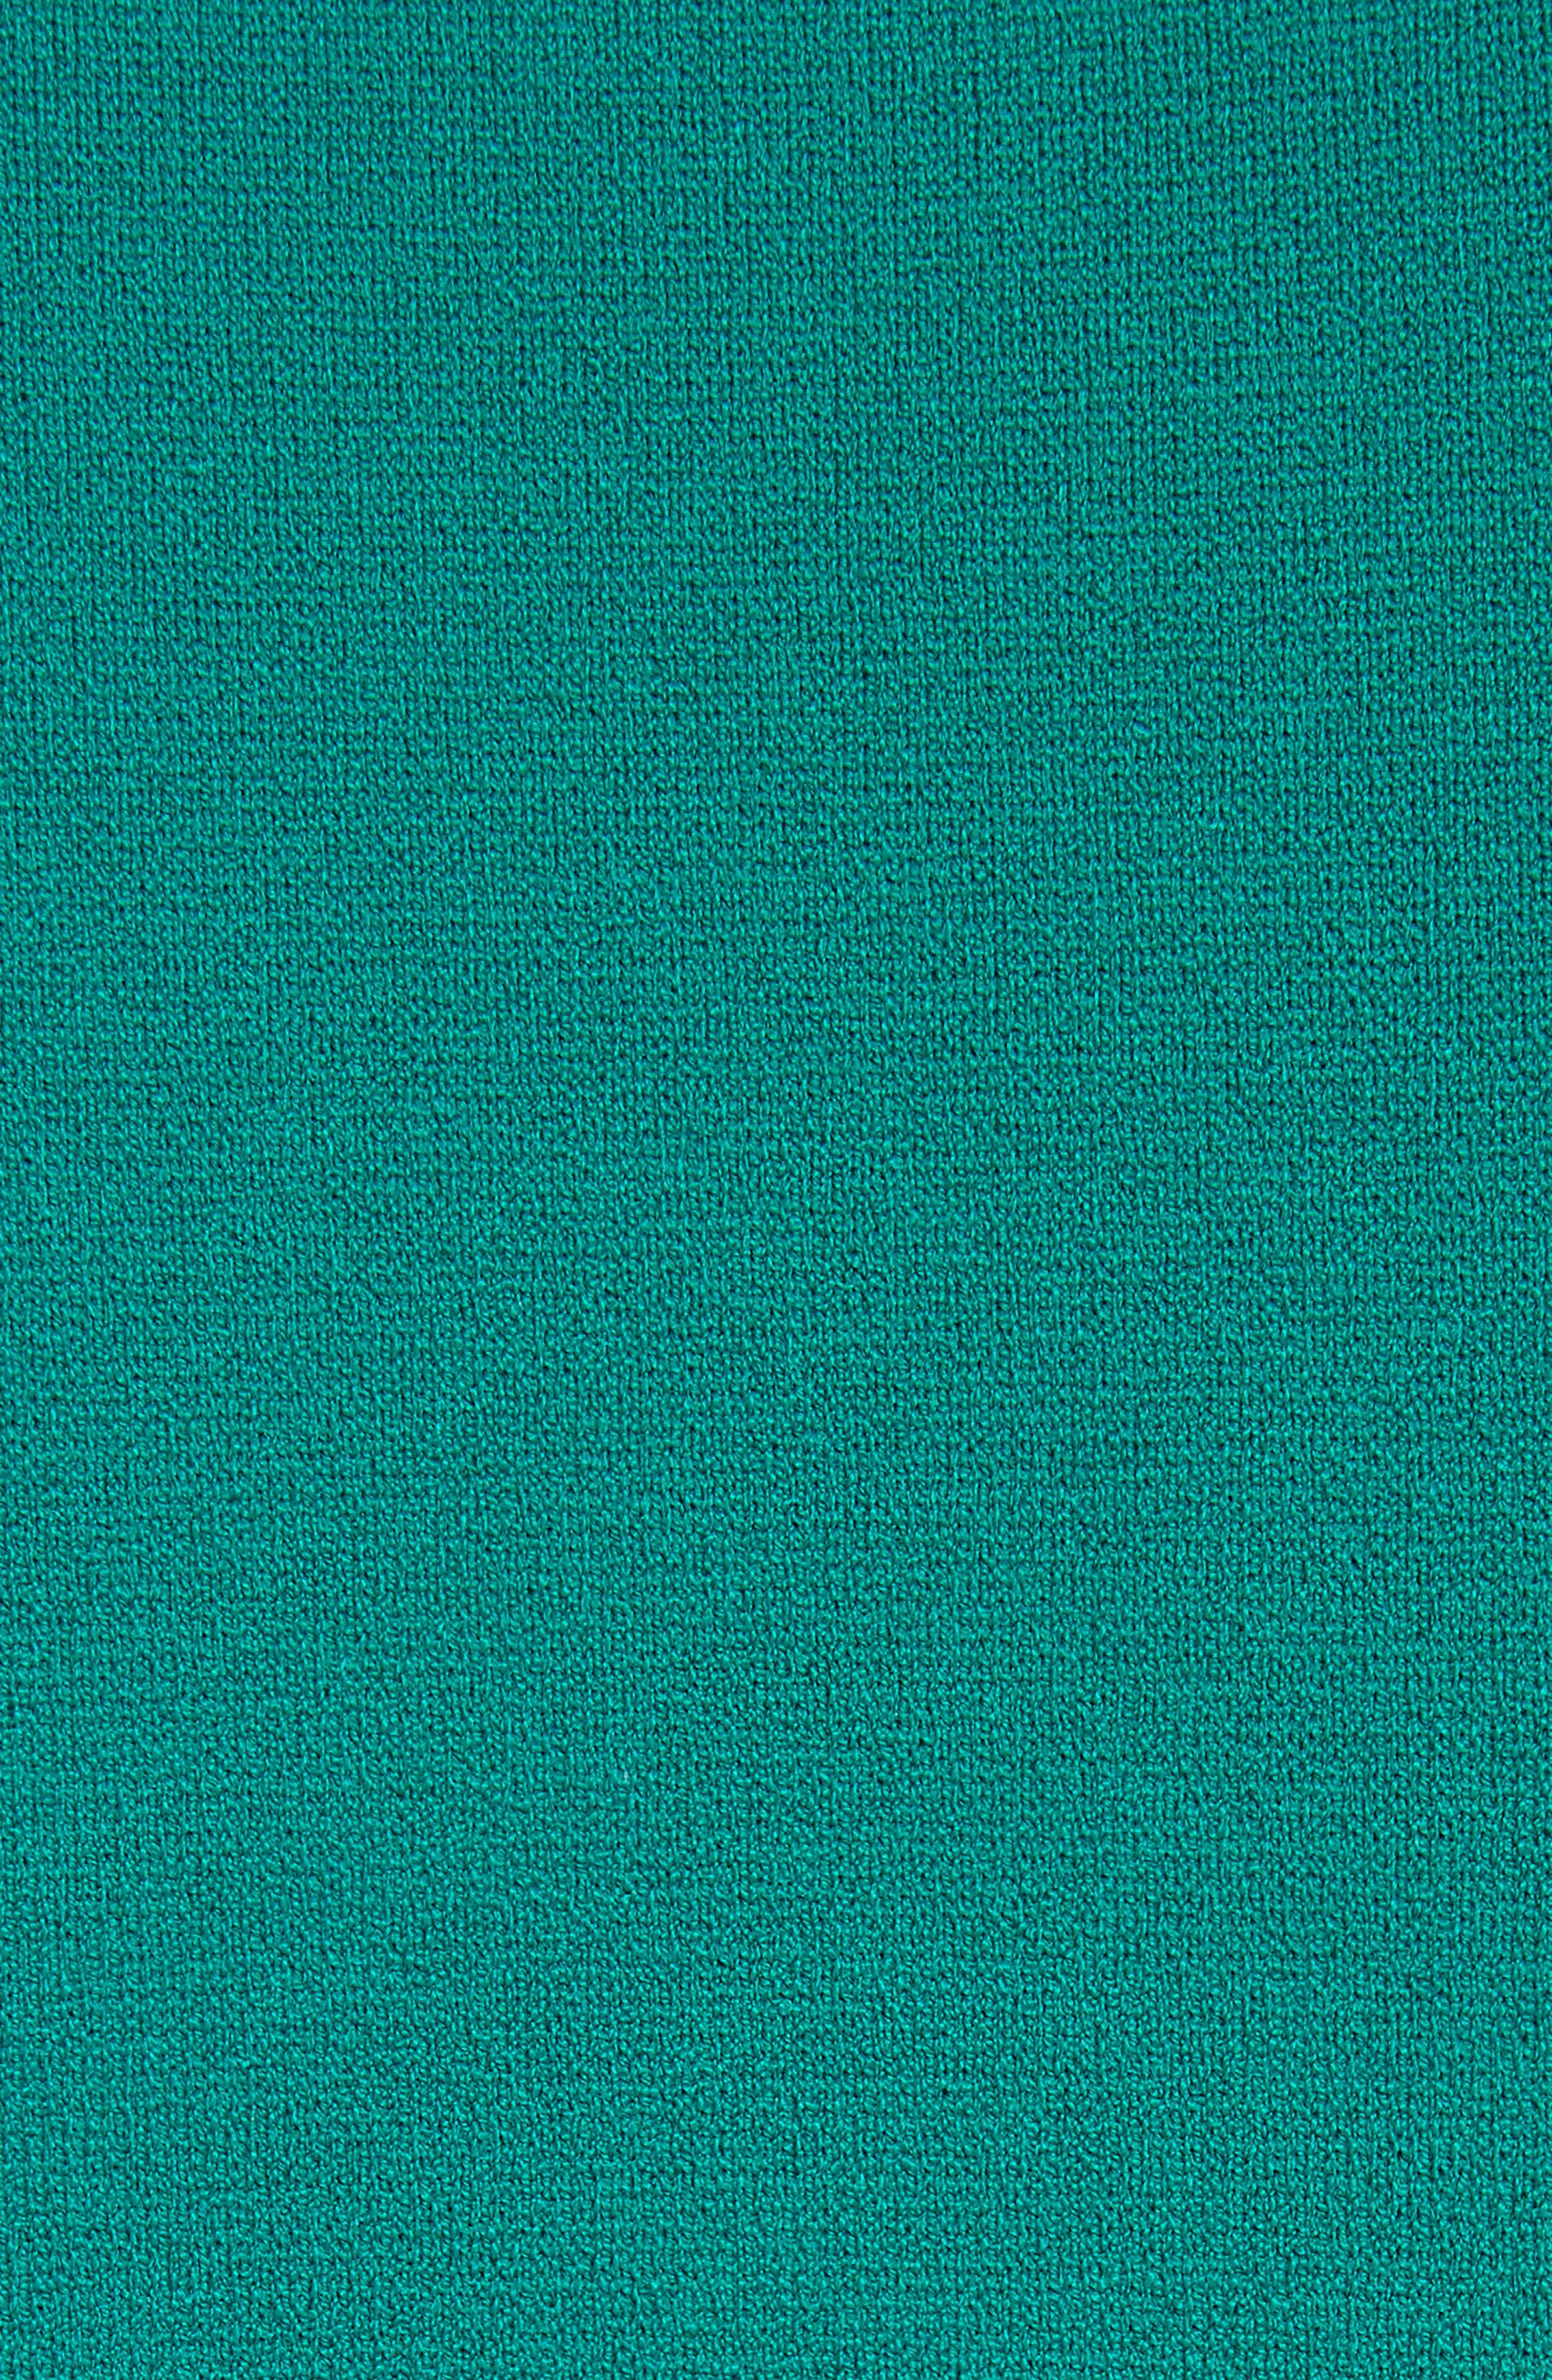 Diane von Furstenberg Stripe Short Sleeve Sweater Dress,                             Alternate thumbnail 5, color,                             Juniper Multi